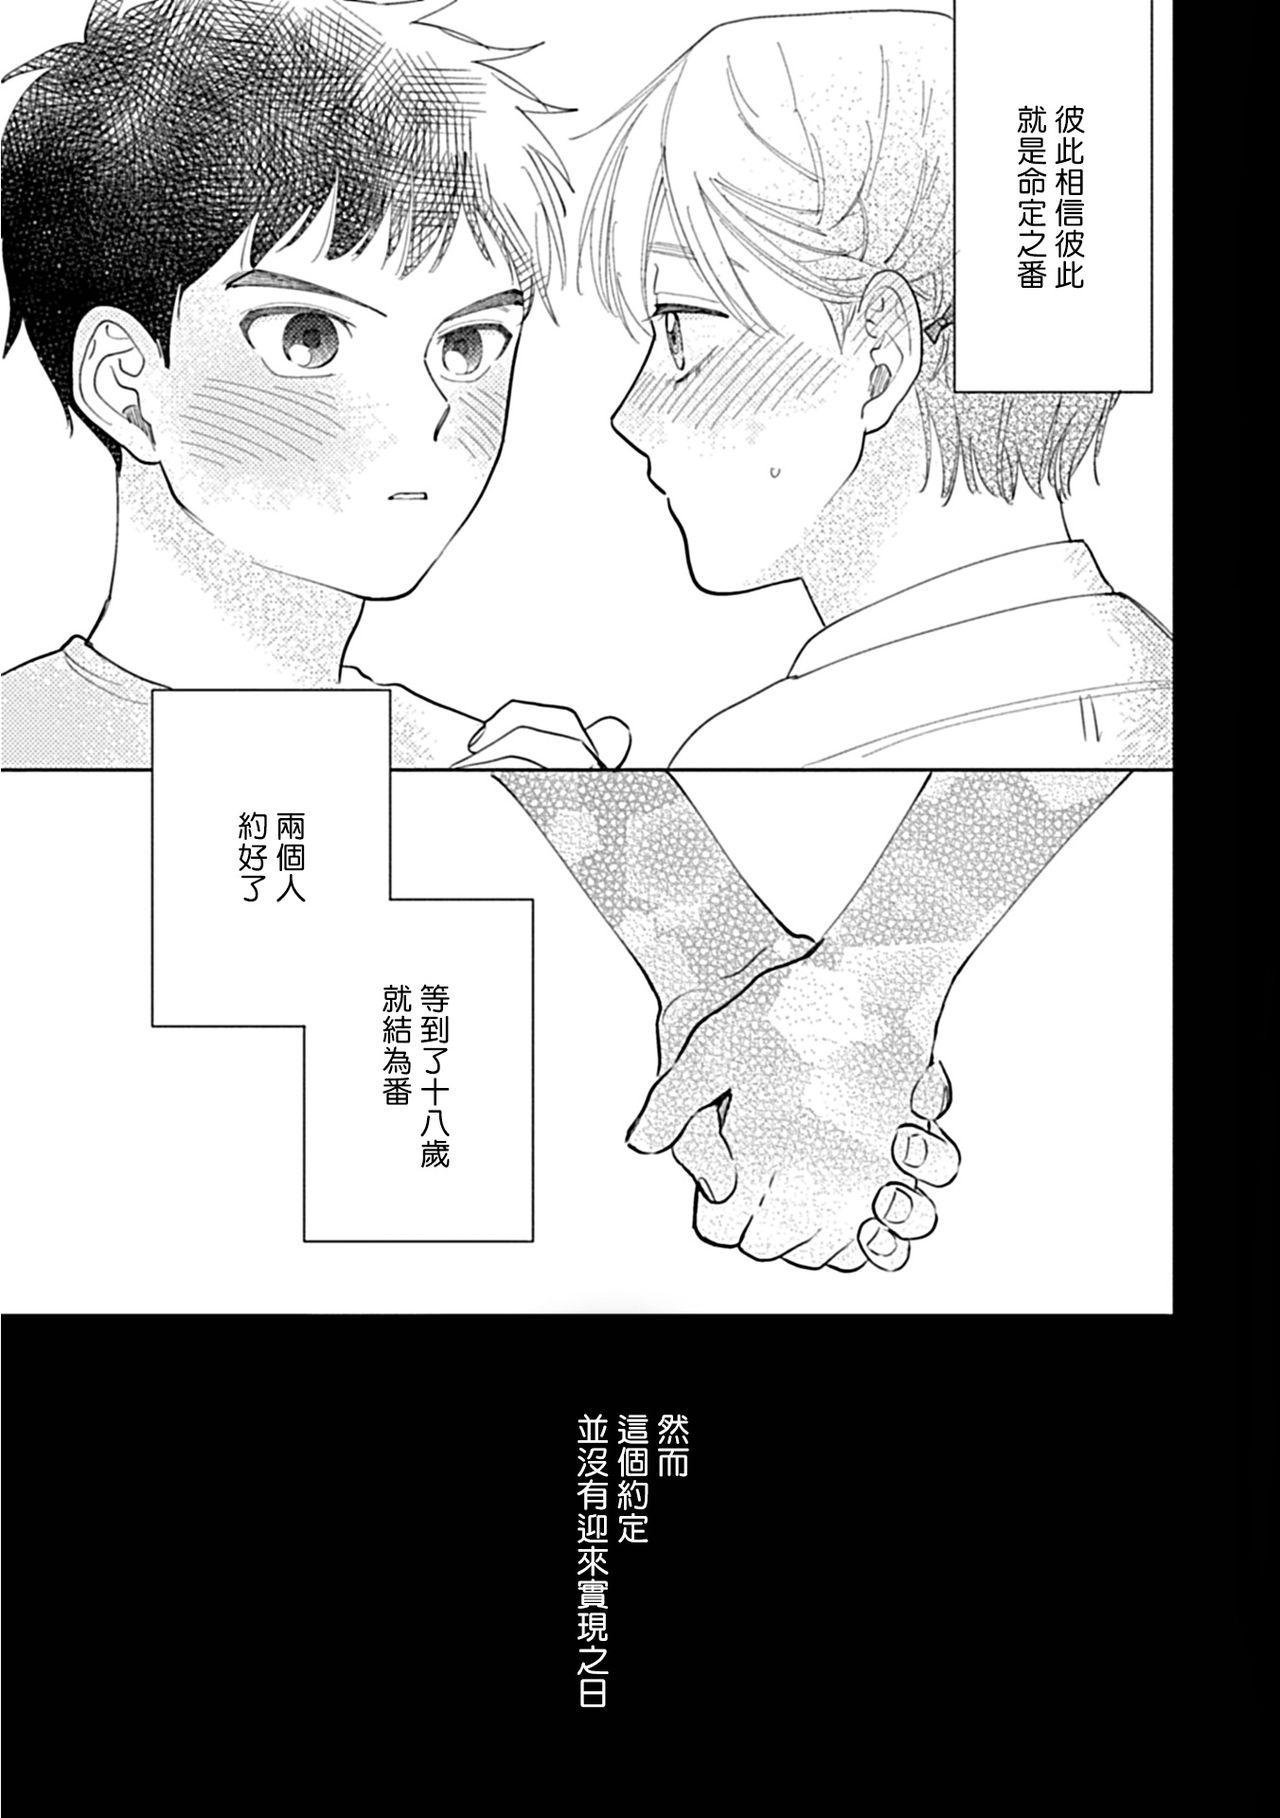 Bokura wa Unmei Janai | 我们不是命定之番 1-3 4